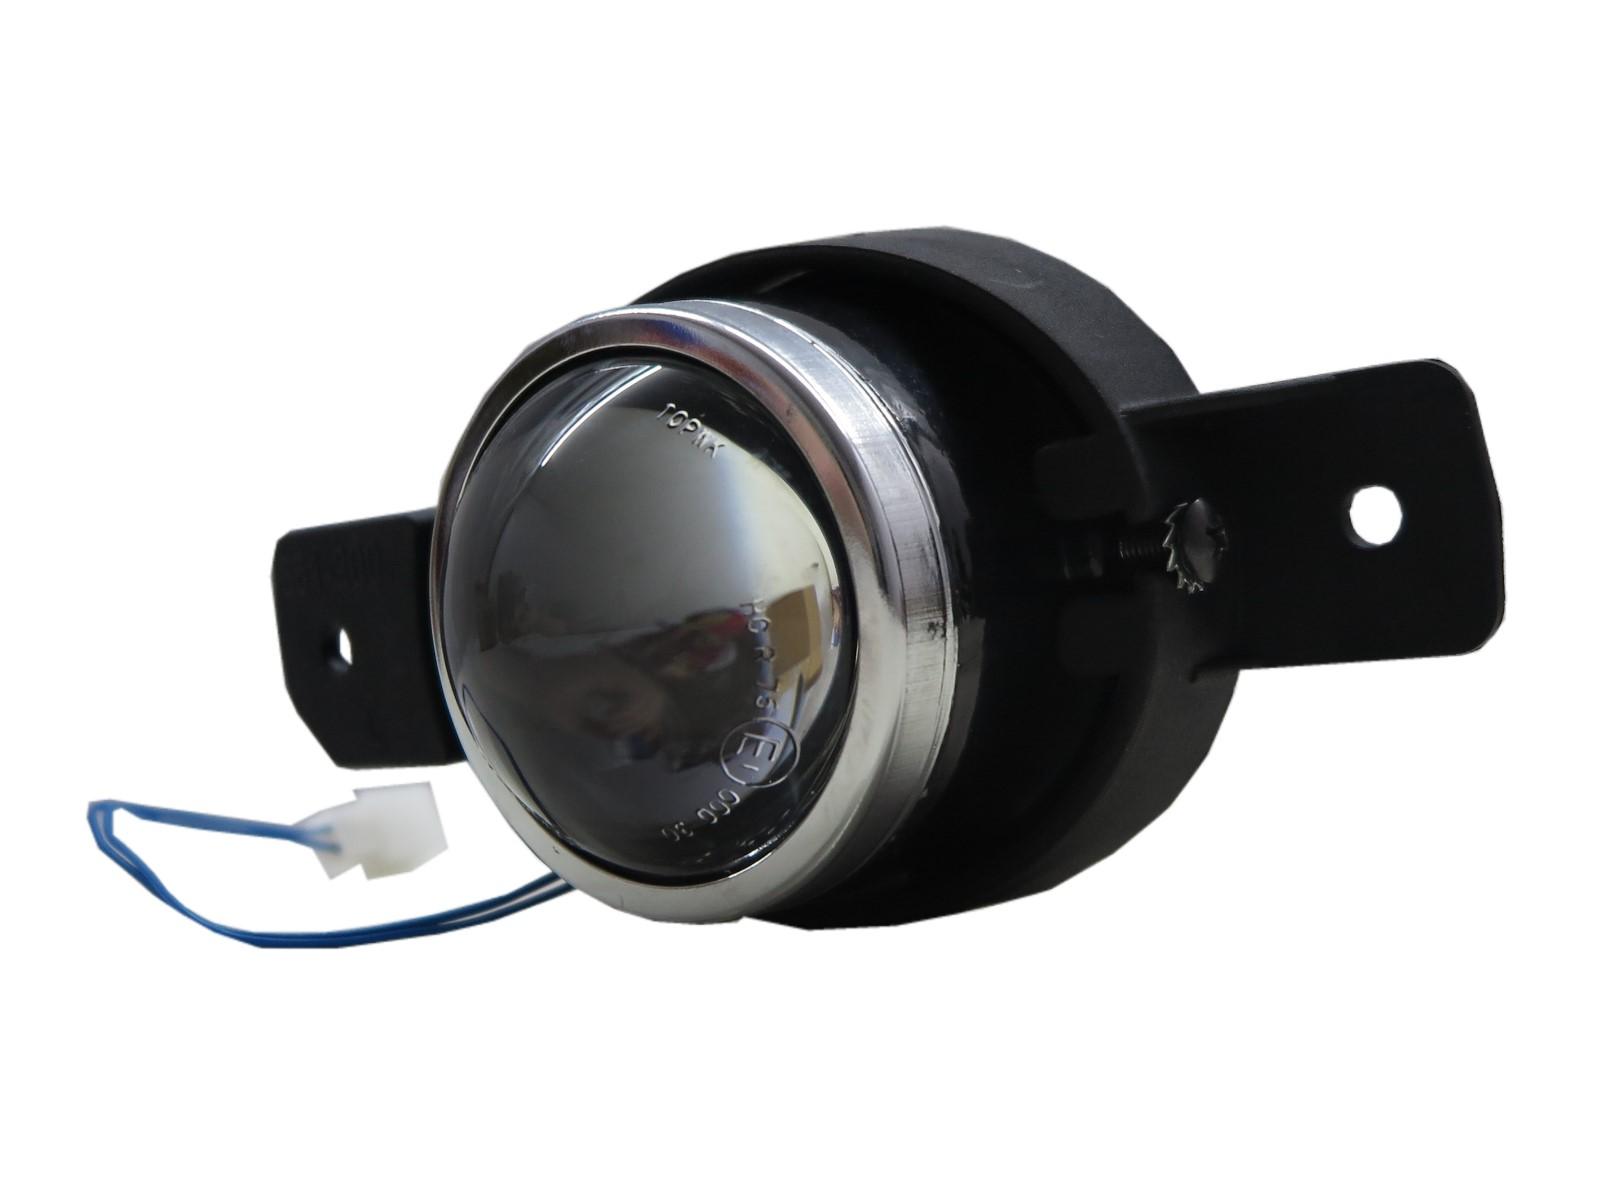 thumbnail 2 - VERSA N17 MK2 2012-2019 Sedan 4D Projector Dual Beam Fog Light Black for NISSAN